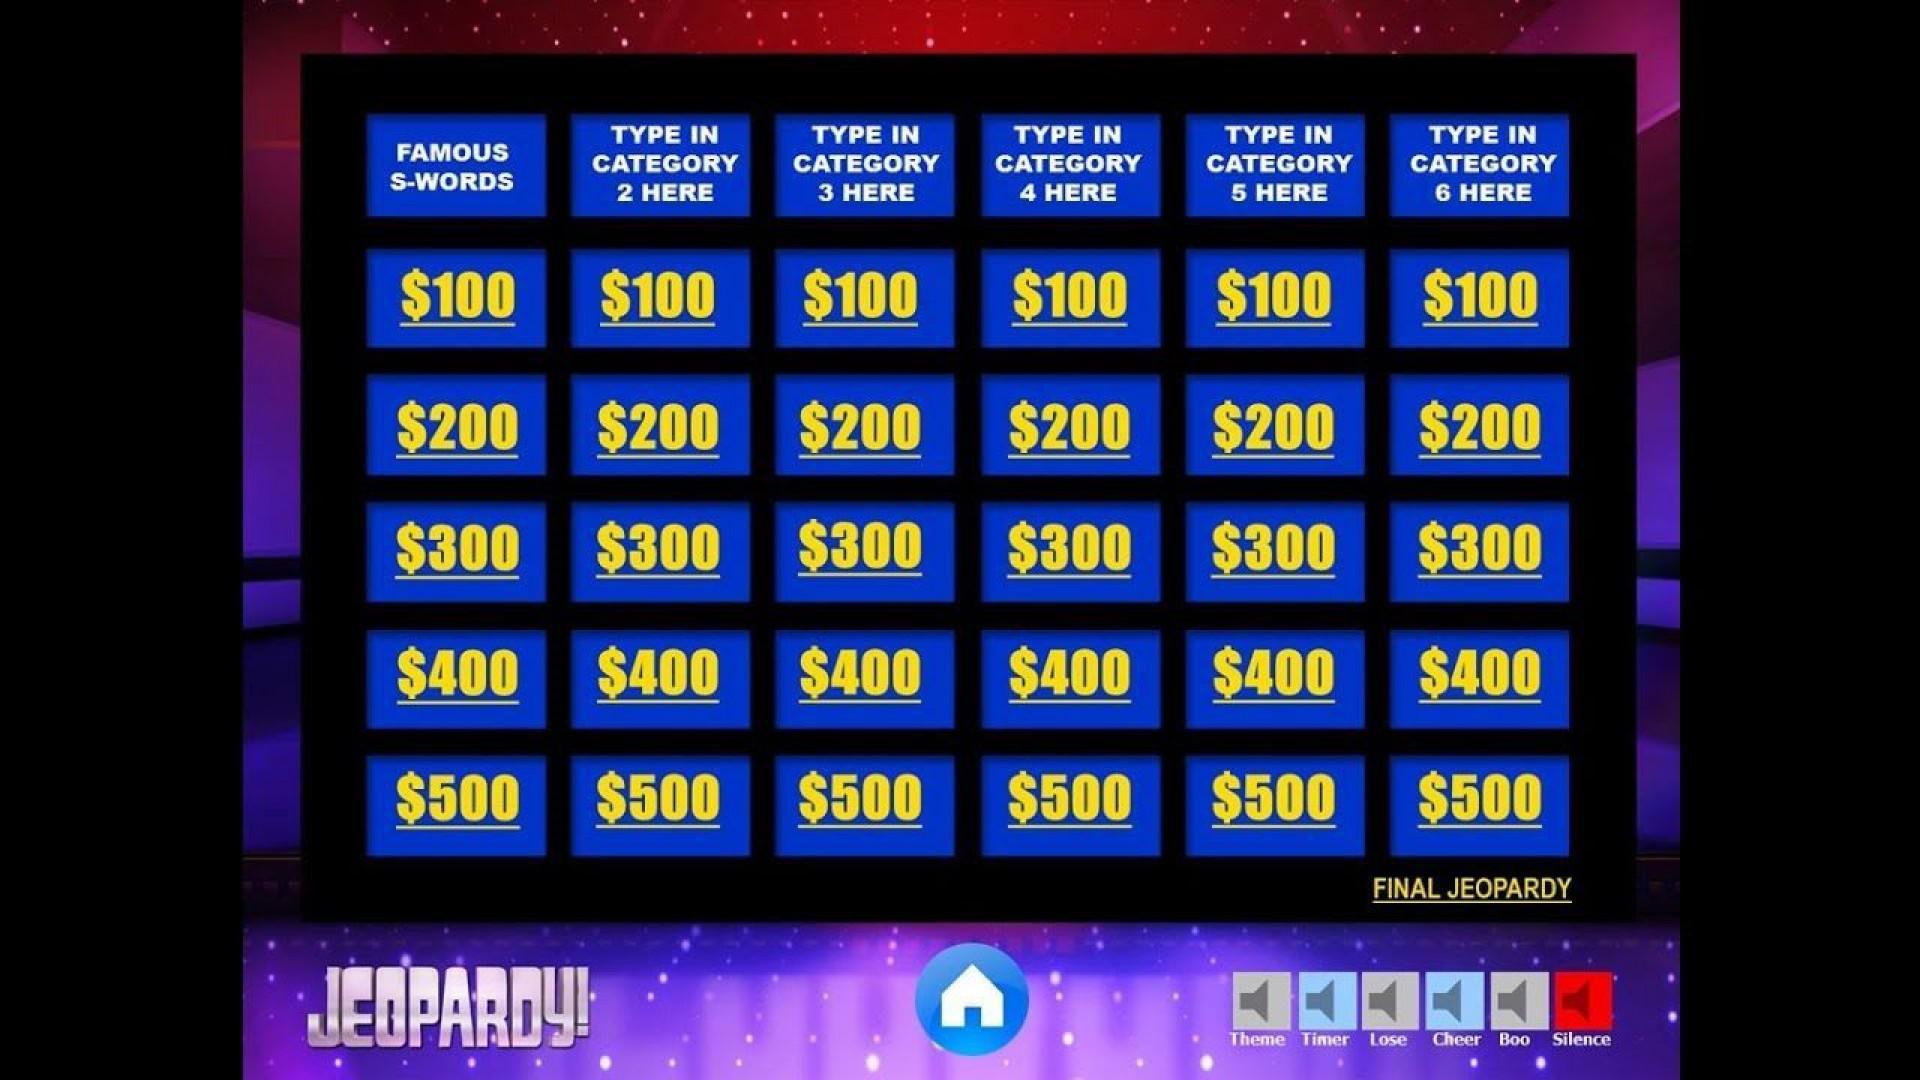 004 Rare Jeopardy Template Google Slide Highest Clarity  Slides Board Blank Best1920